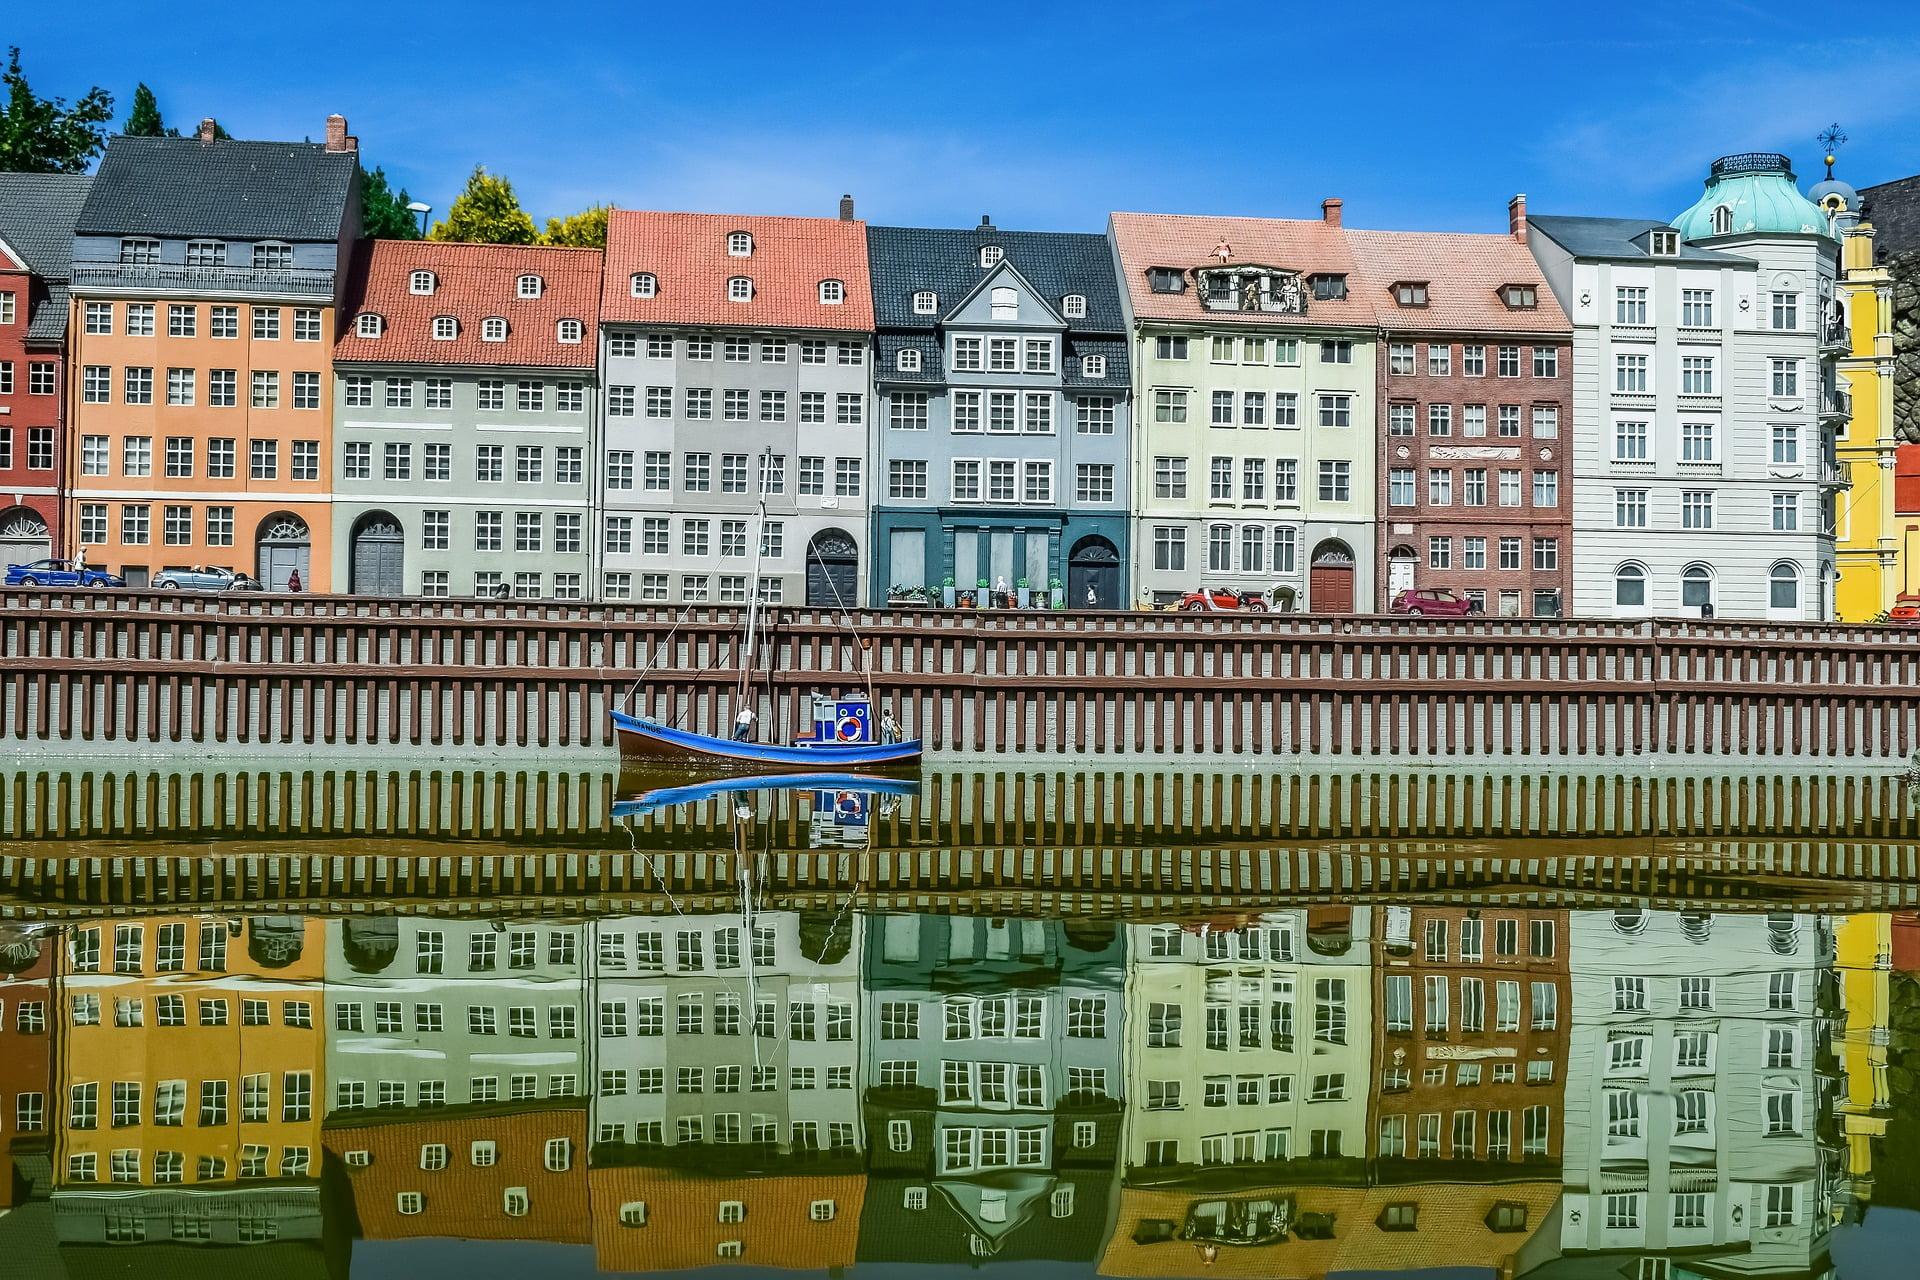 Danish Regulator Statistics Show Denmark Among Europe's Top Participants